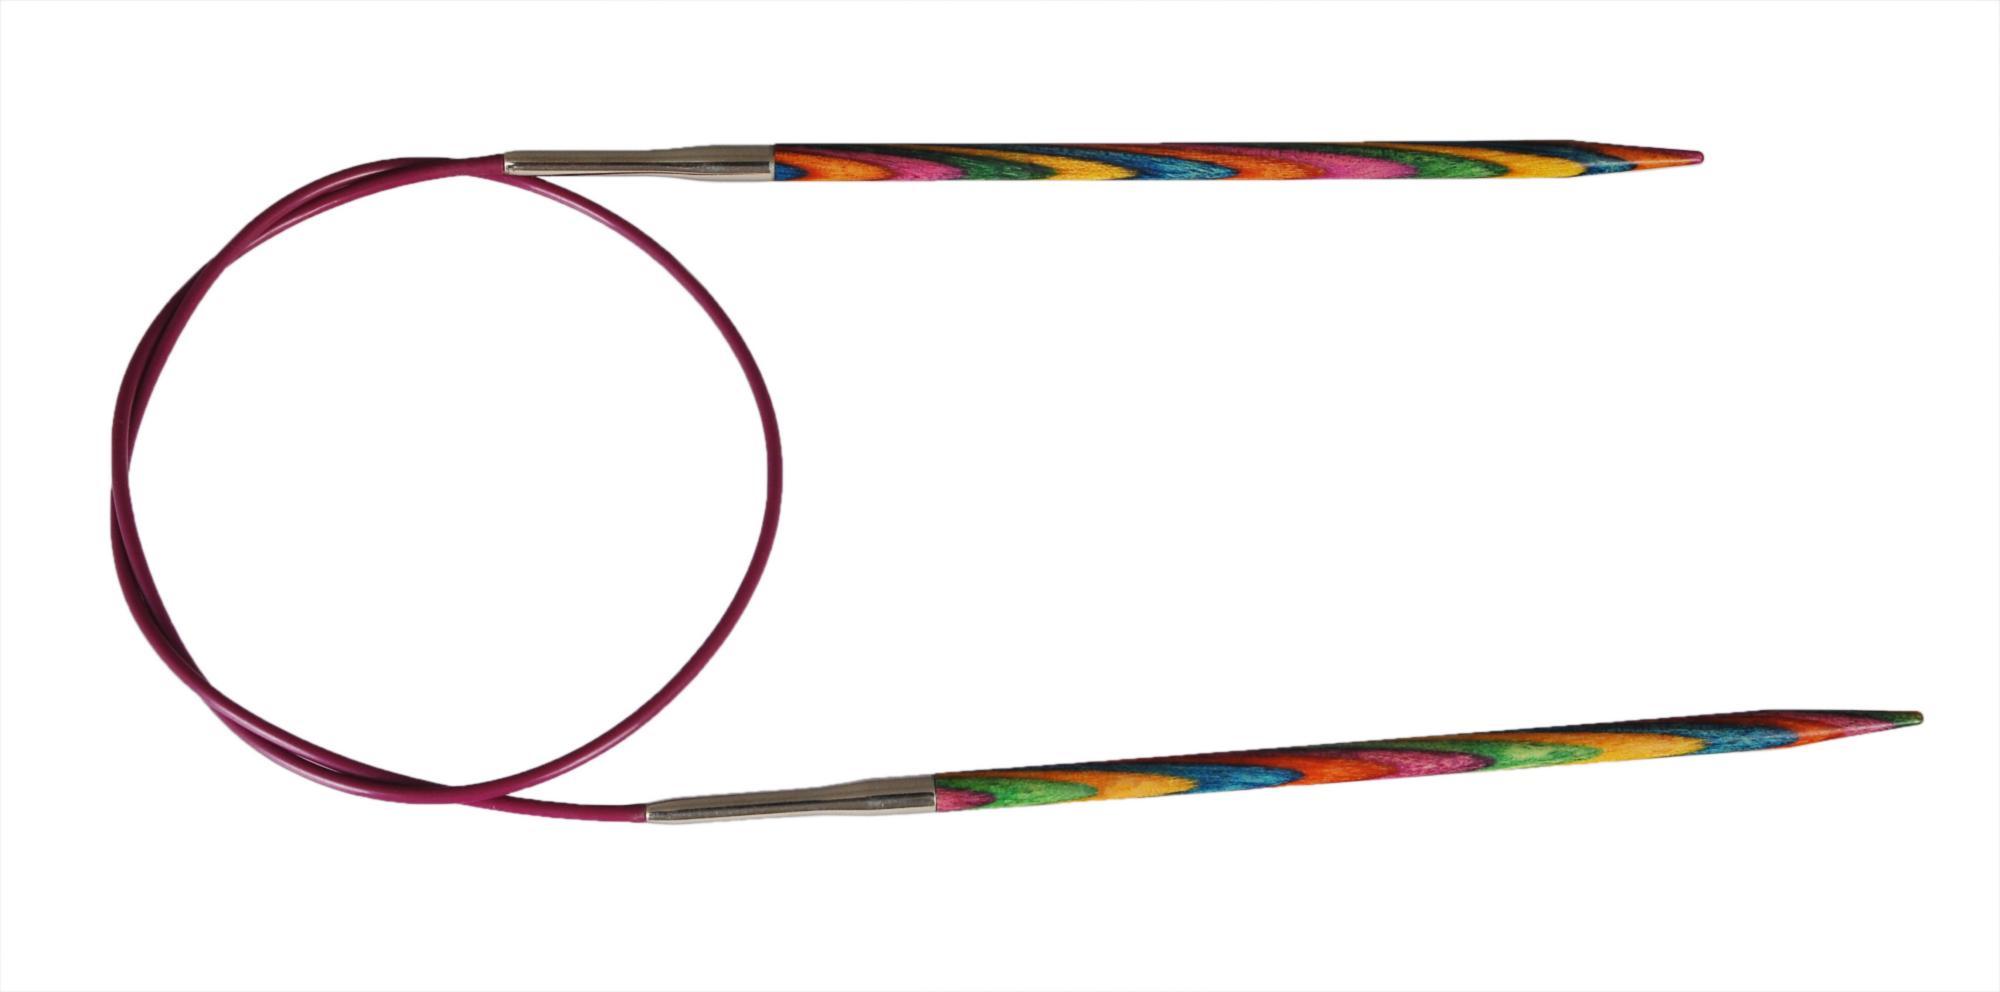 Спицы круговые 100 см Symfonie Wood KnitPro, 20361, 2.00 мм